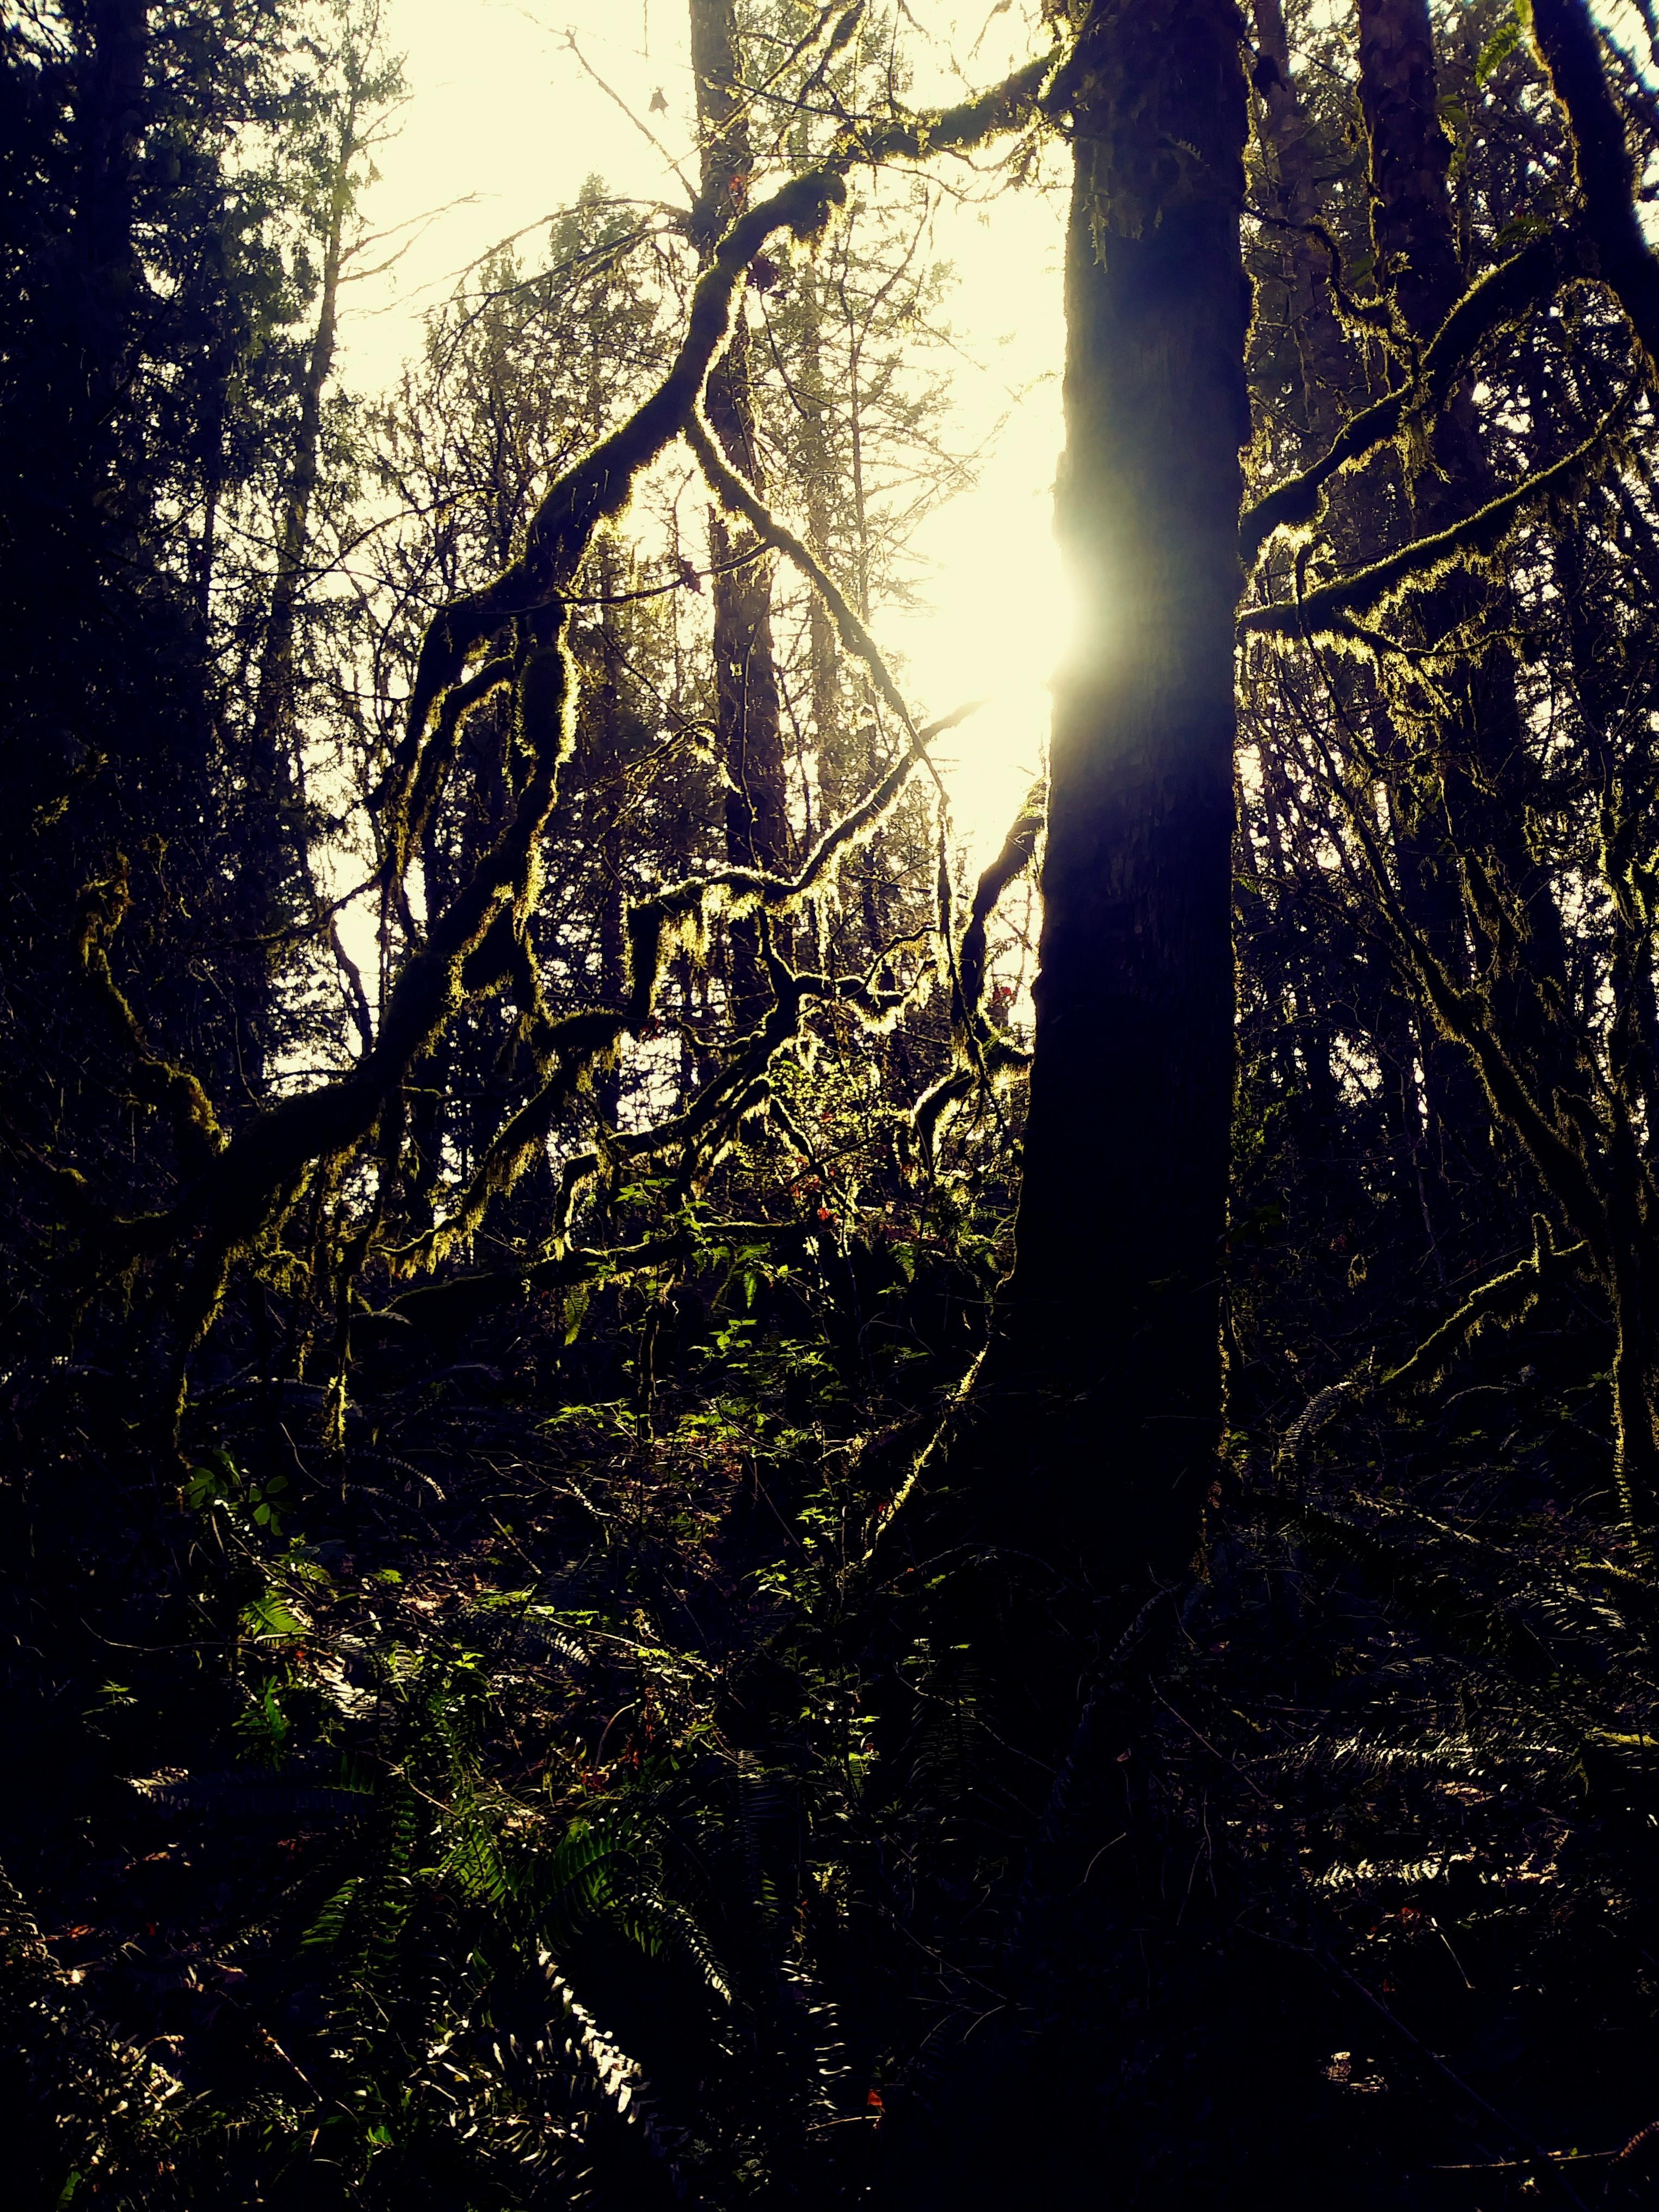 Late sunlight